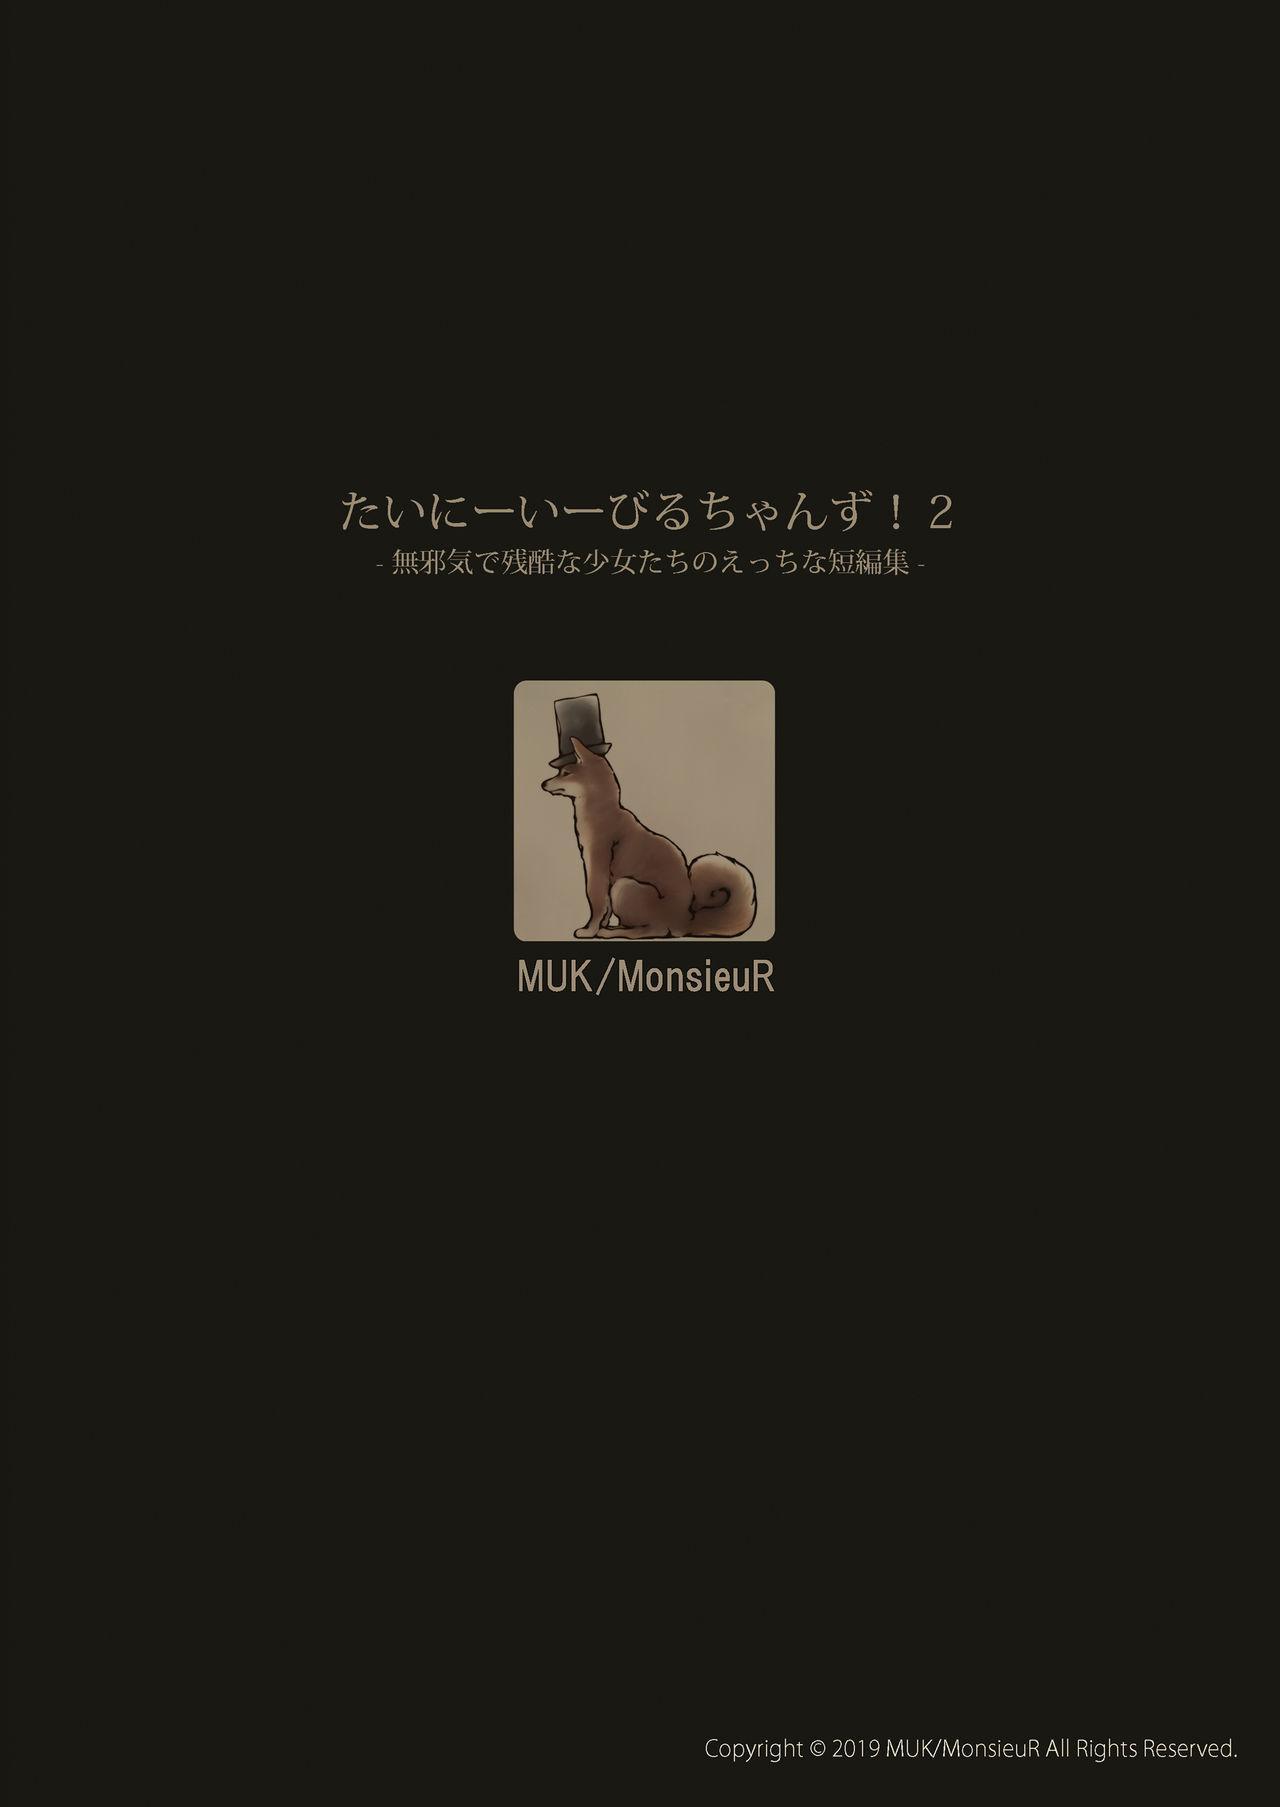 [MonsieuR (MUK)] Tiny Evil chans! 2 -Mujaki de Zankoku na Shoujo-tachi no Ecchi na Tanpenshuu- [English] {Hennojin} [Decensored] [Digital] 39